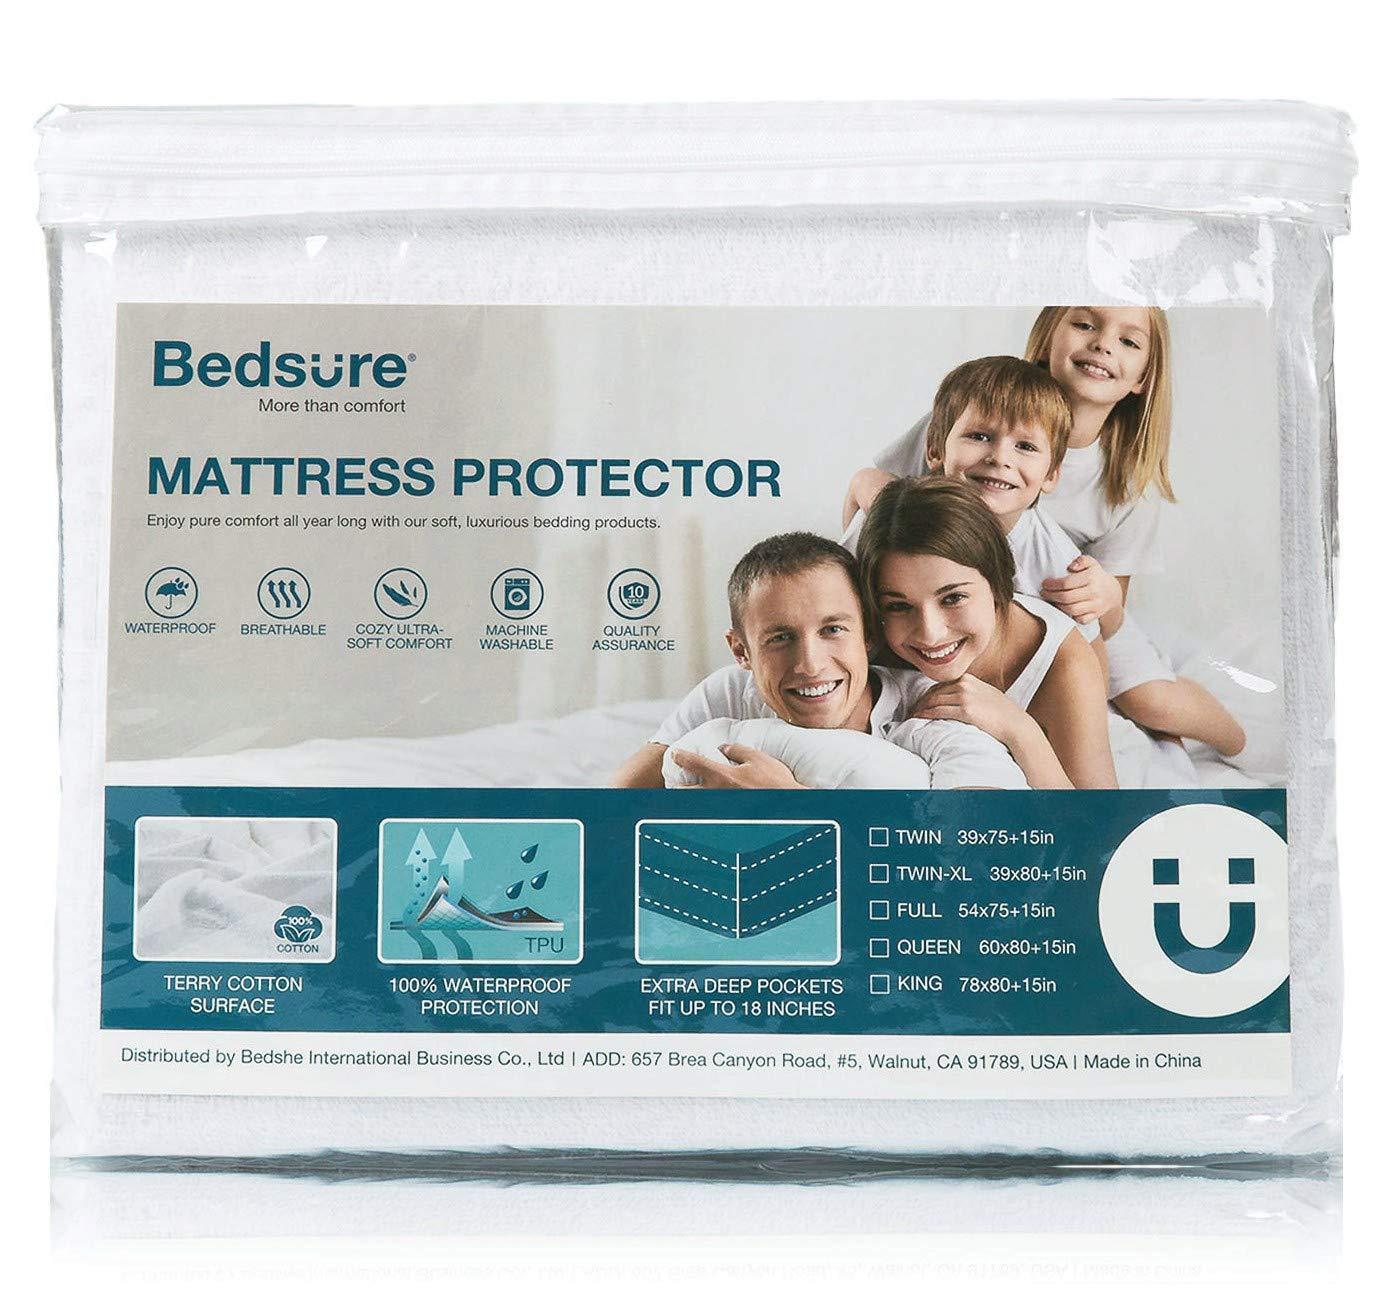 Bedsure 100 Waterproof Mattress Protector King Size Terry Cotton Deep Pocket Hypoallergenic Mattress